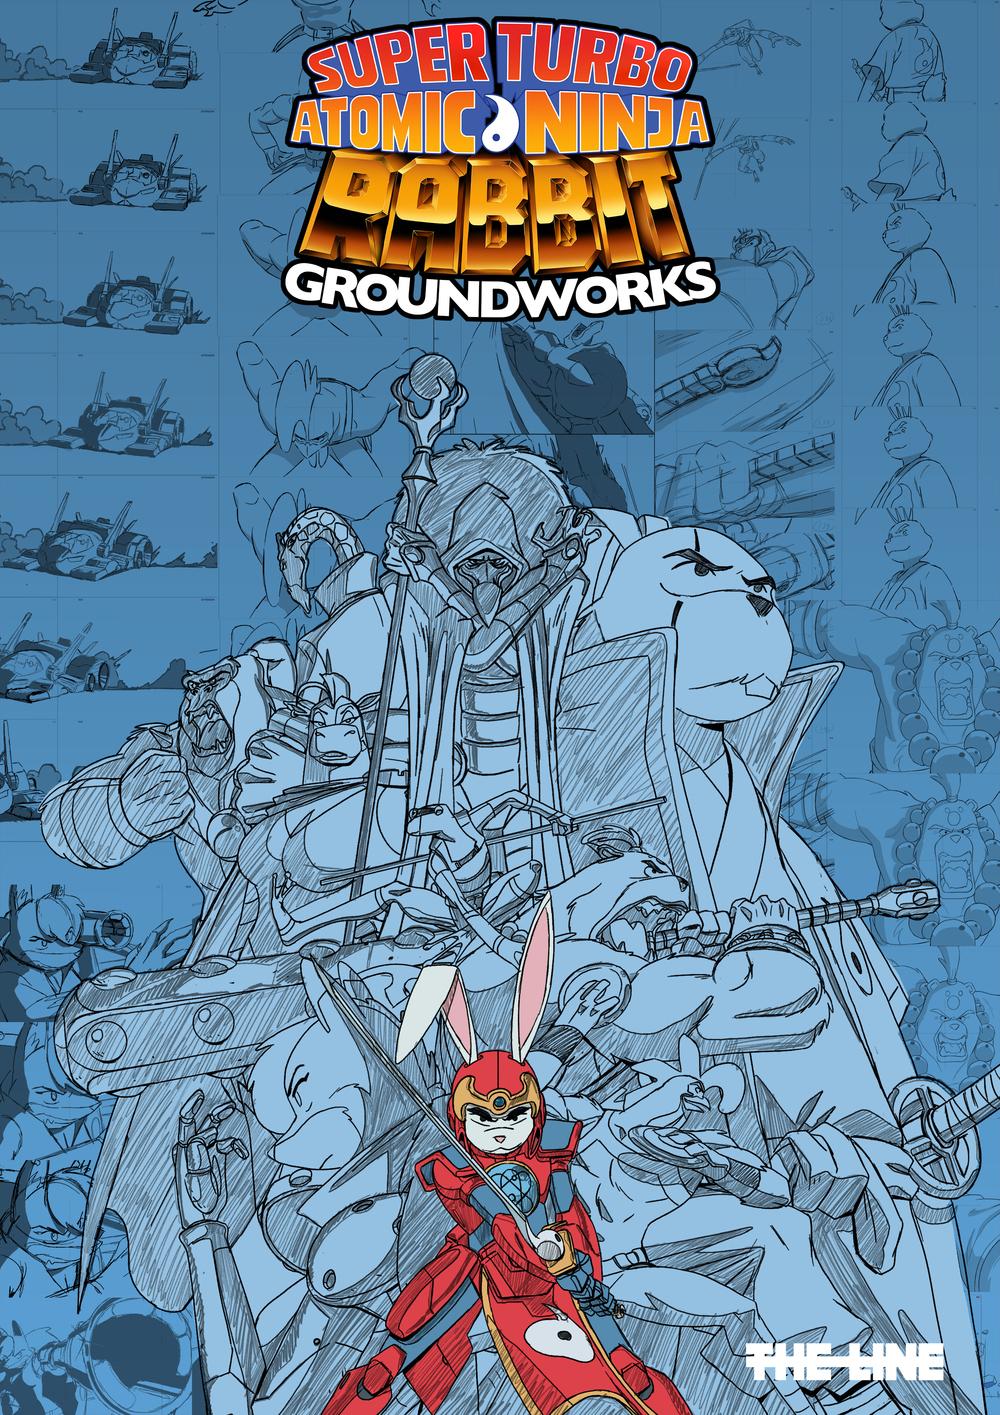 Super Turbo Atomic Ninja Rabbit Art Book